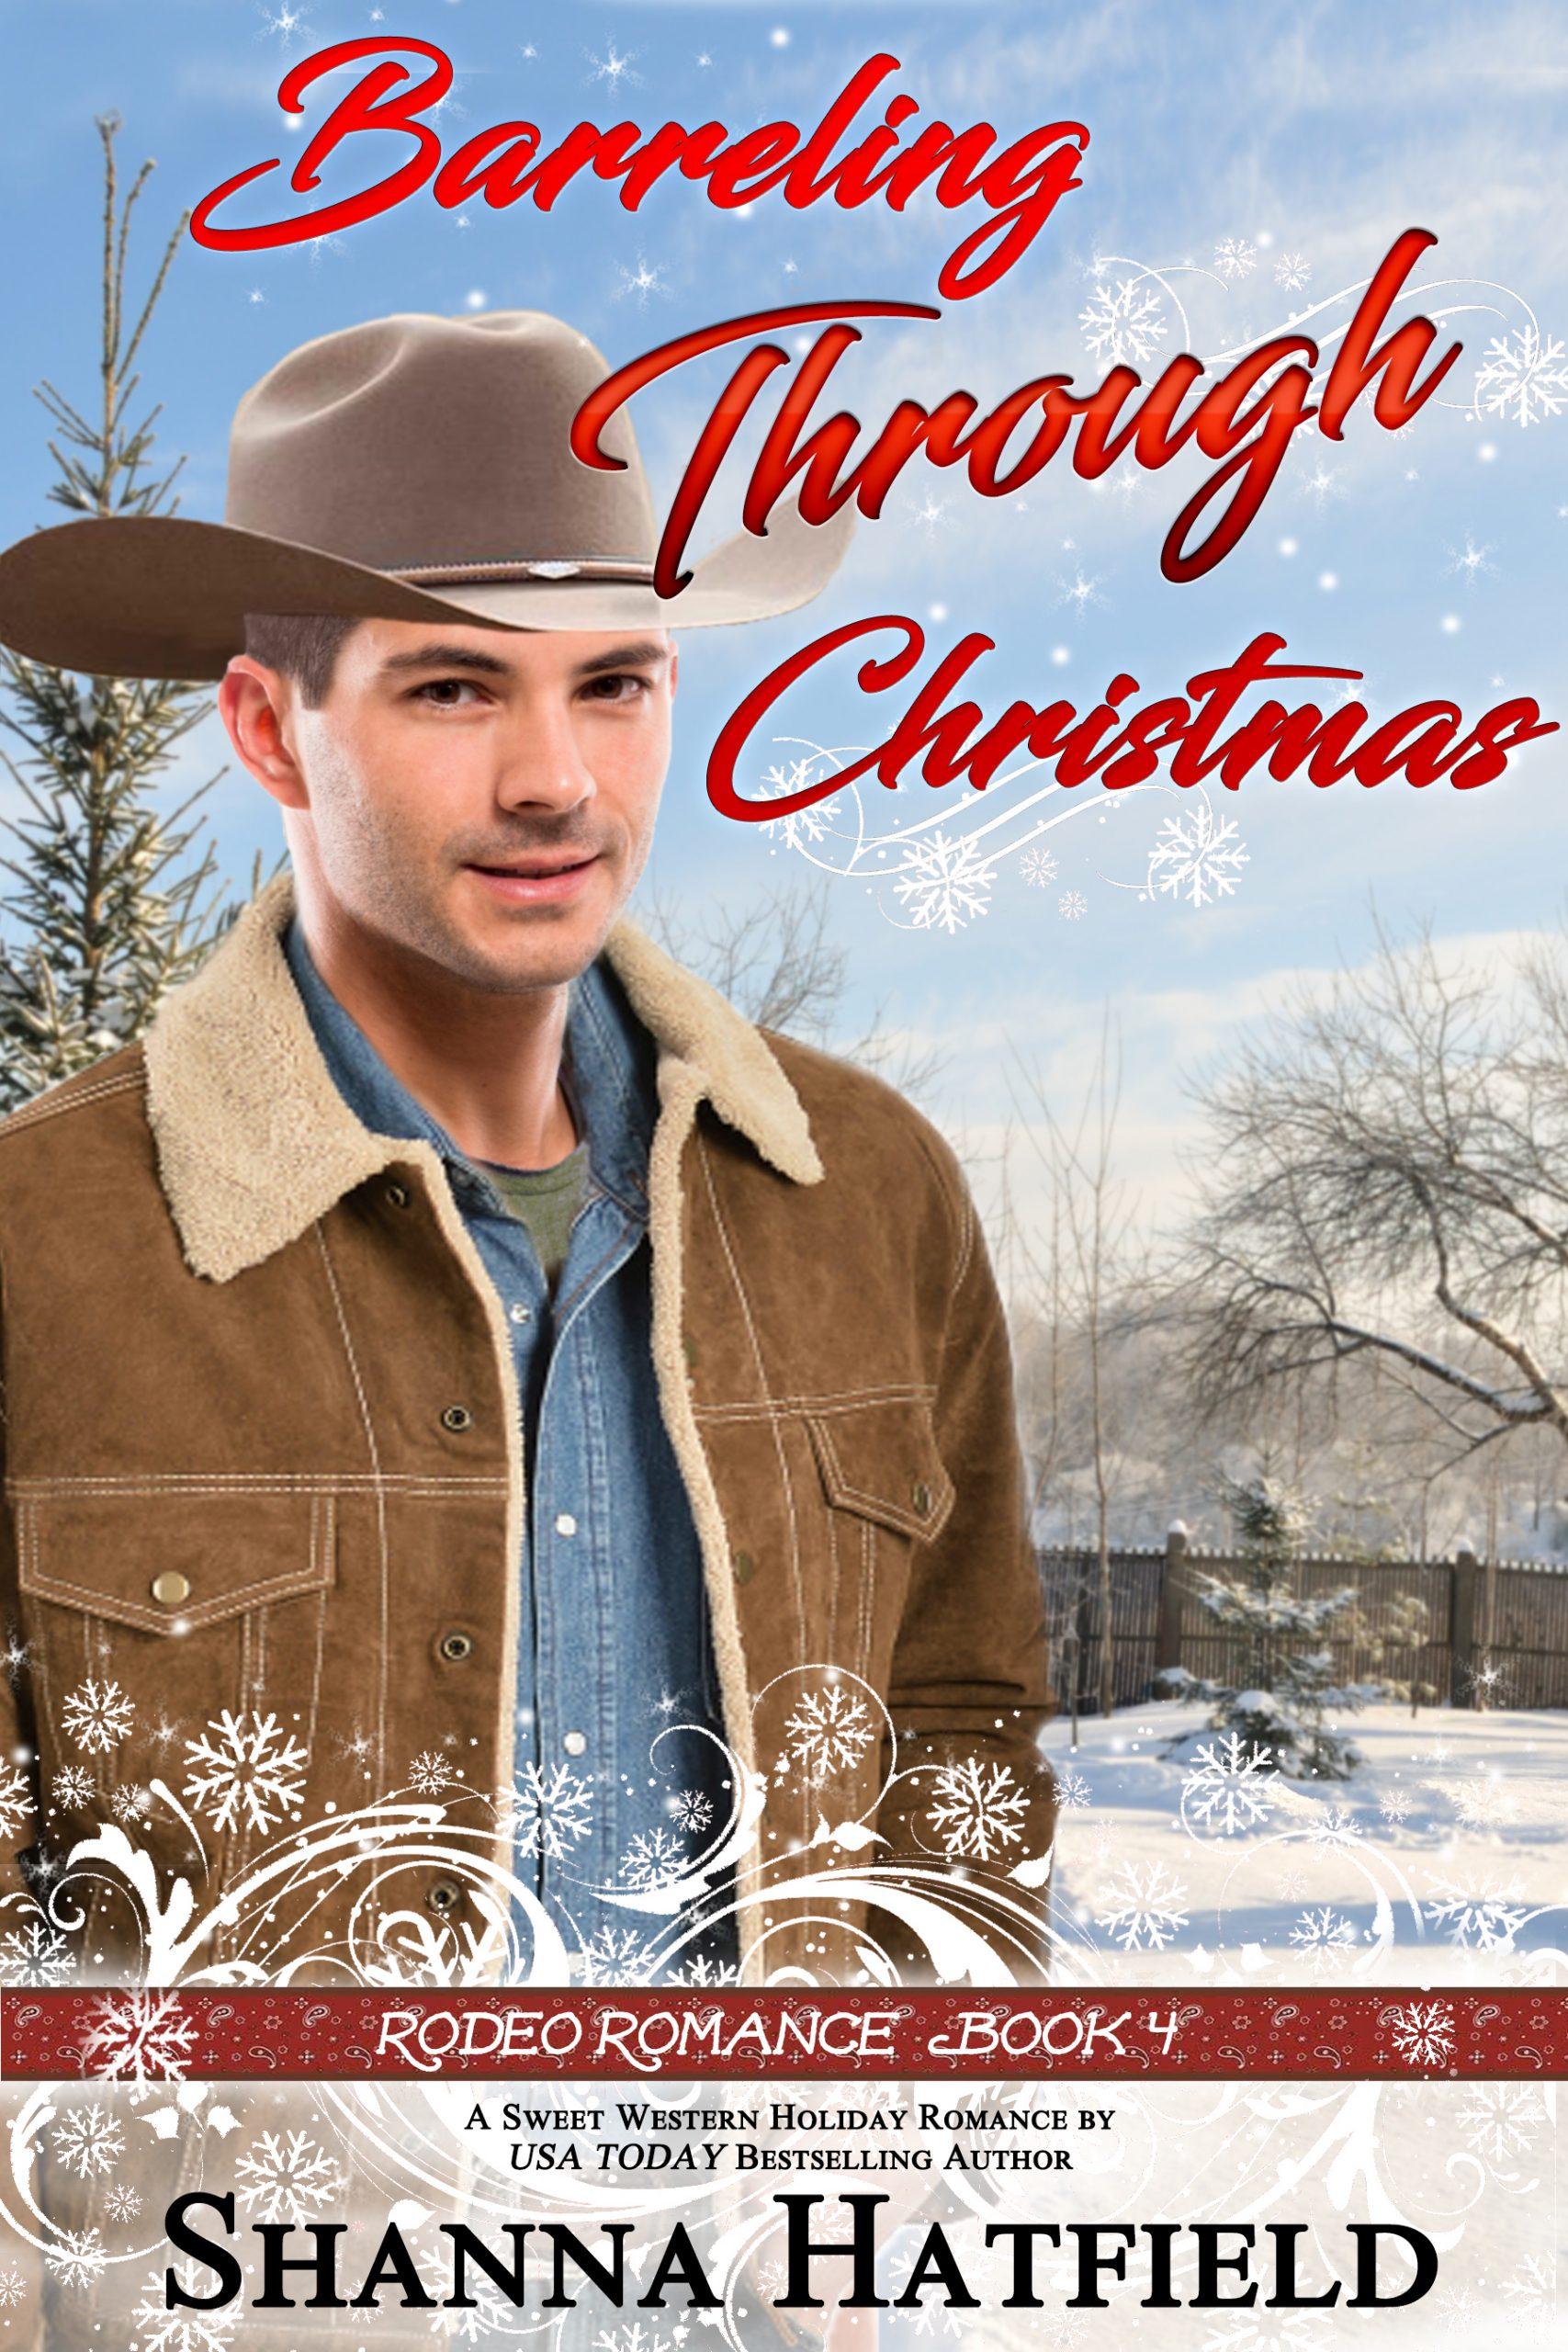 Barreling Through Christmas 20